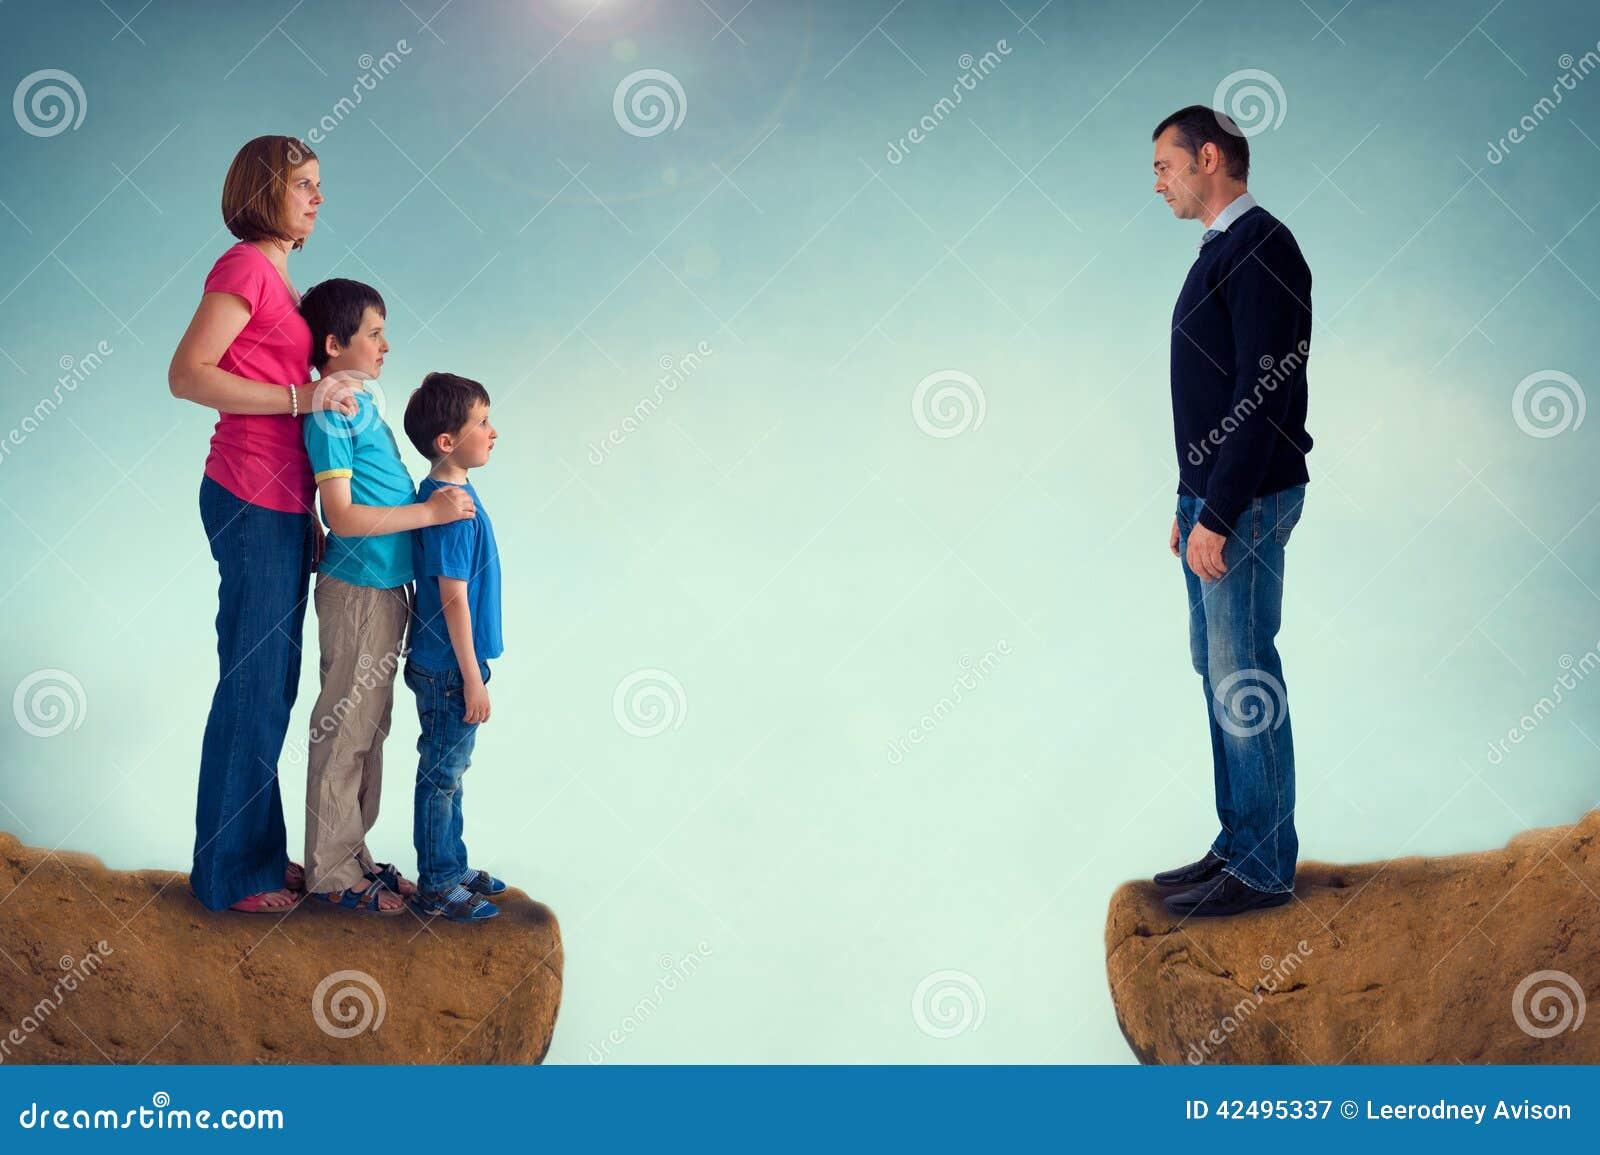 Separaci n de la familia del concepto del divorcio foto de for Concepto de la familia para ninos